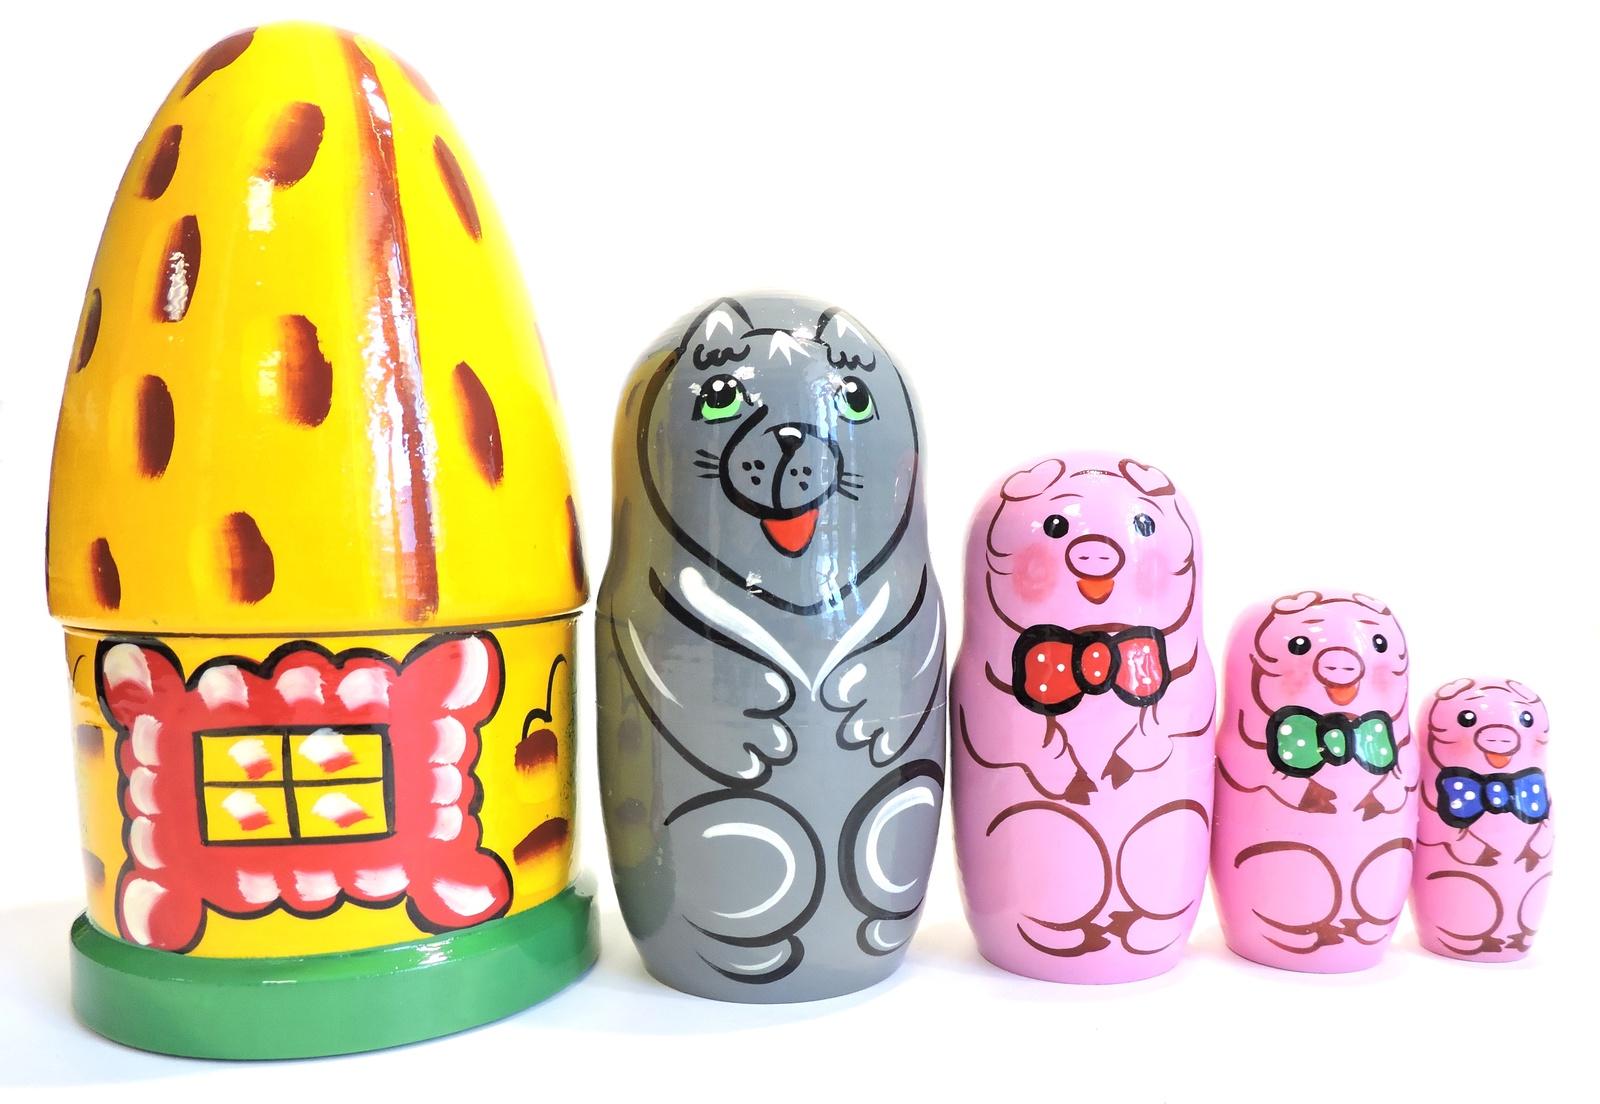 Матрешка Taowa Сказка. Три поросенка, из 5 кукол, 045-138-5, желтый, 9,5 х 9,5 х 17,5 см развивающая игрушка бэмби матрешка 3 поросенка р 45 932